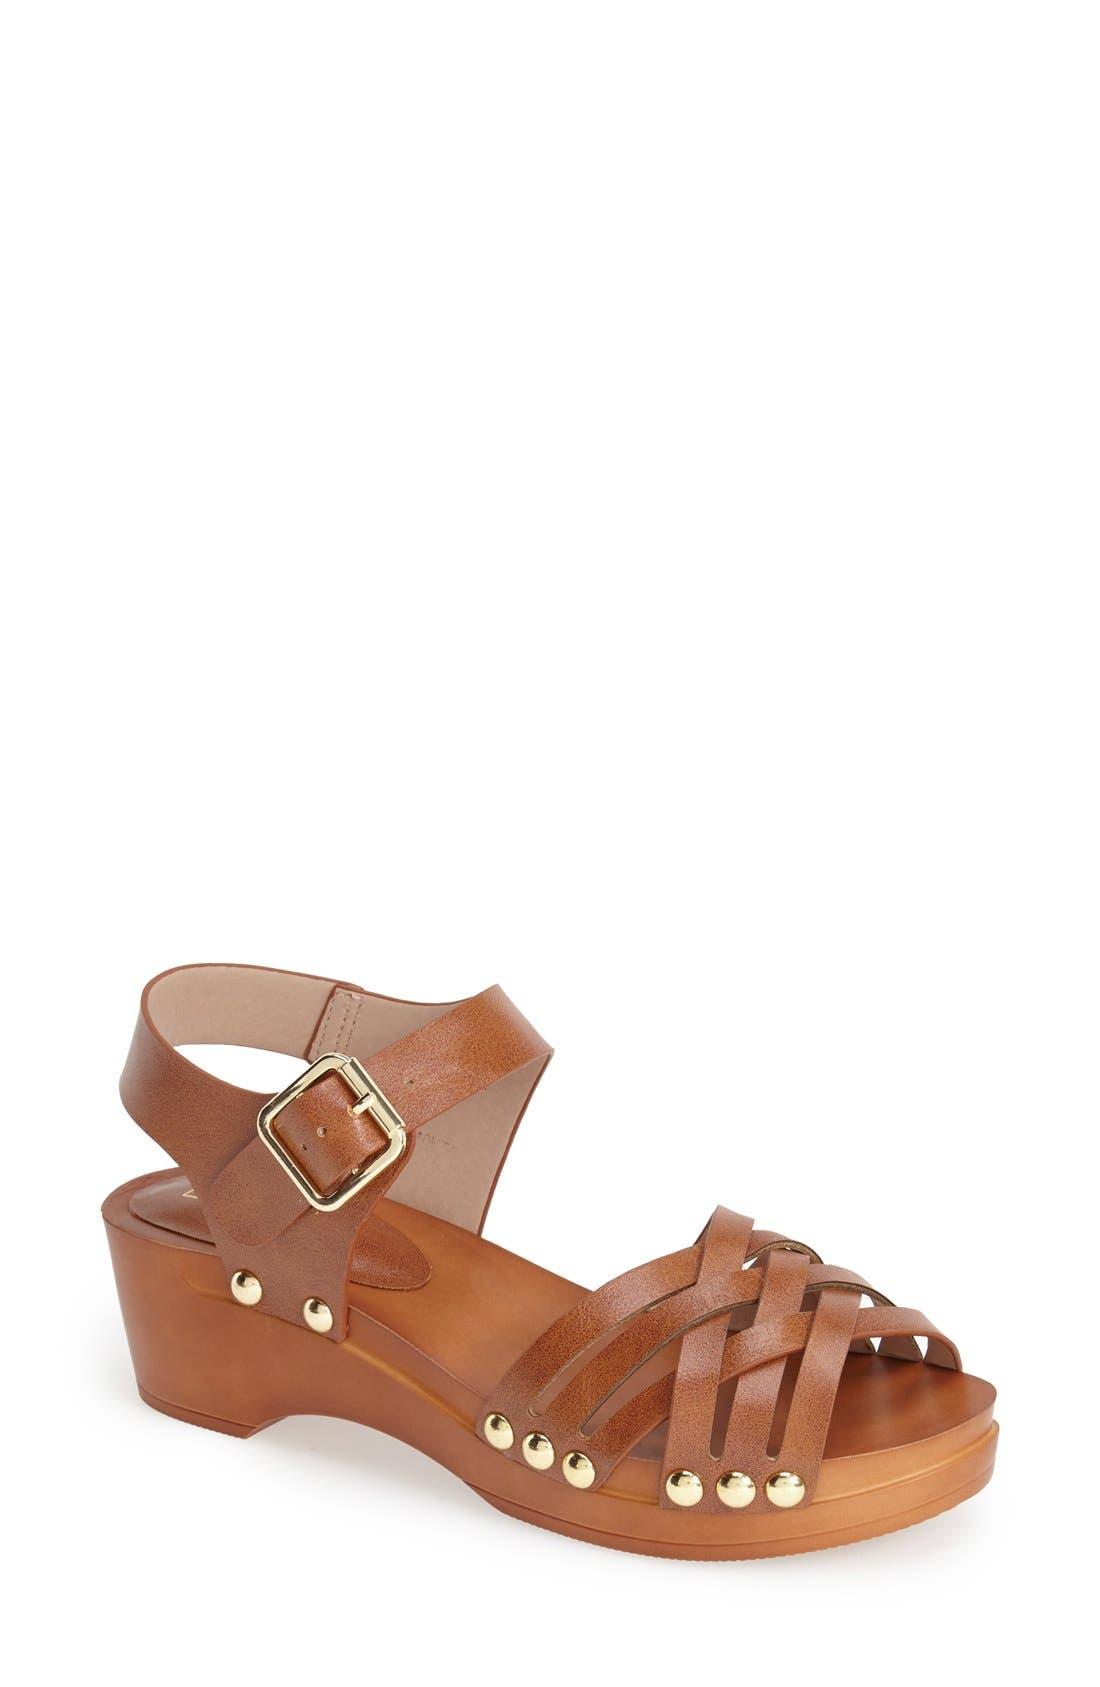 Main Image - Topshop Clog Wedge Sandal (Women)